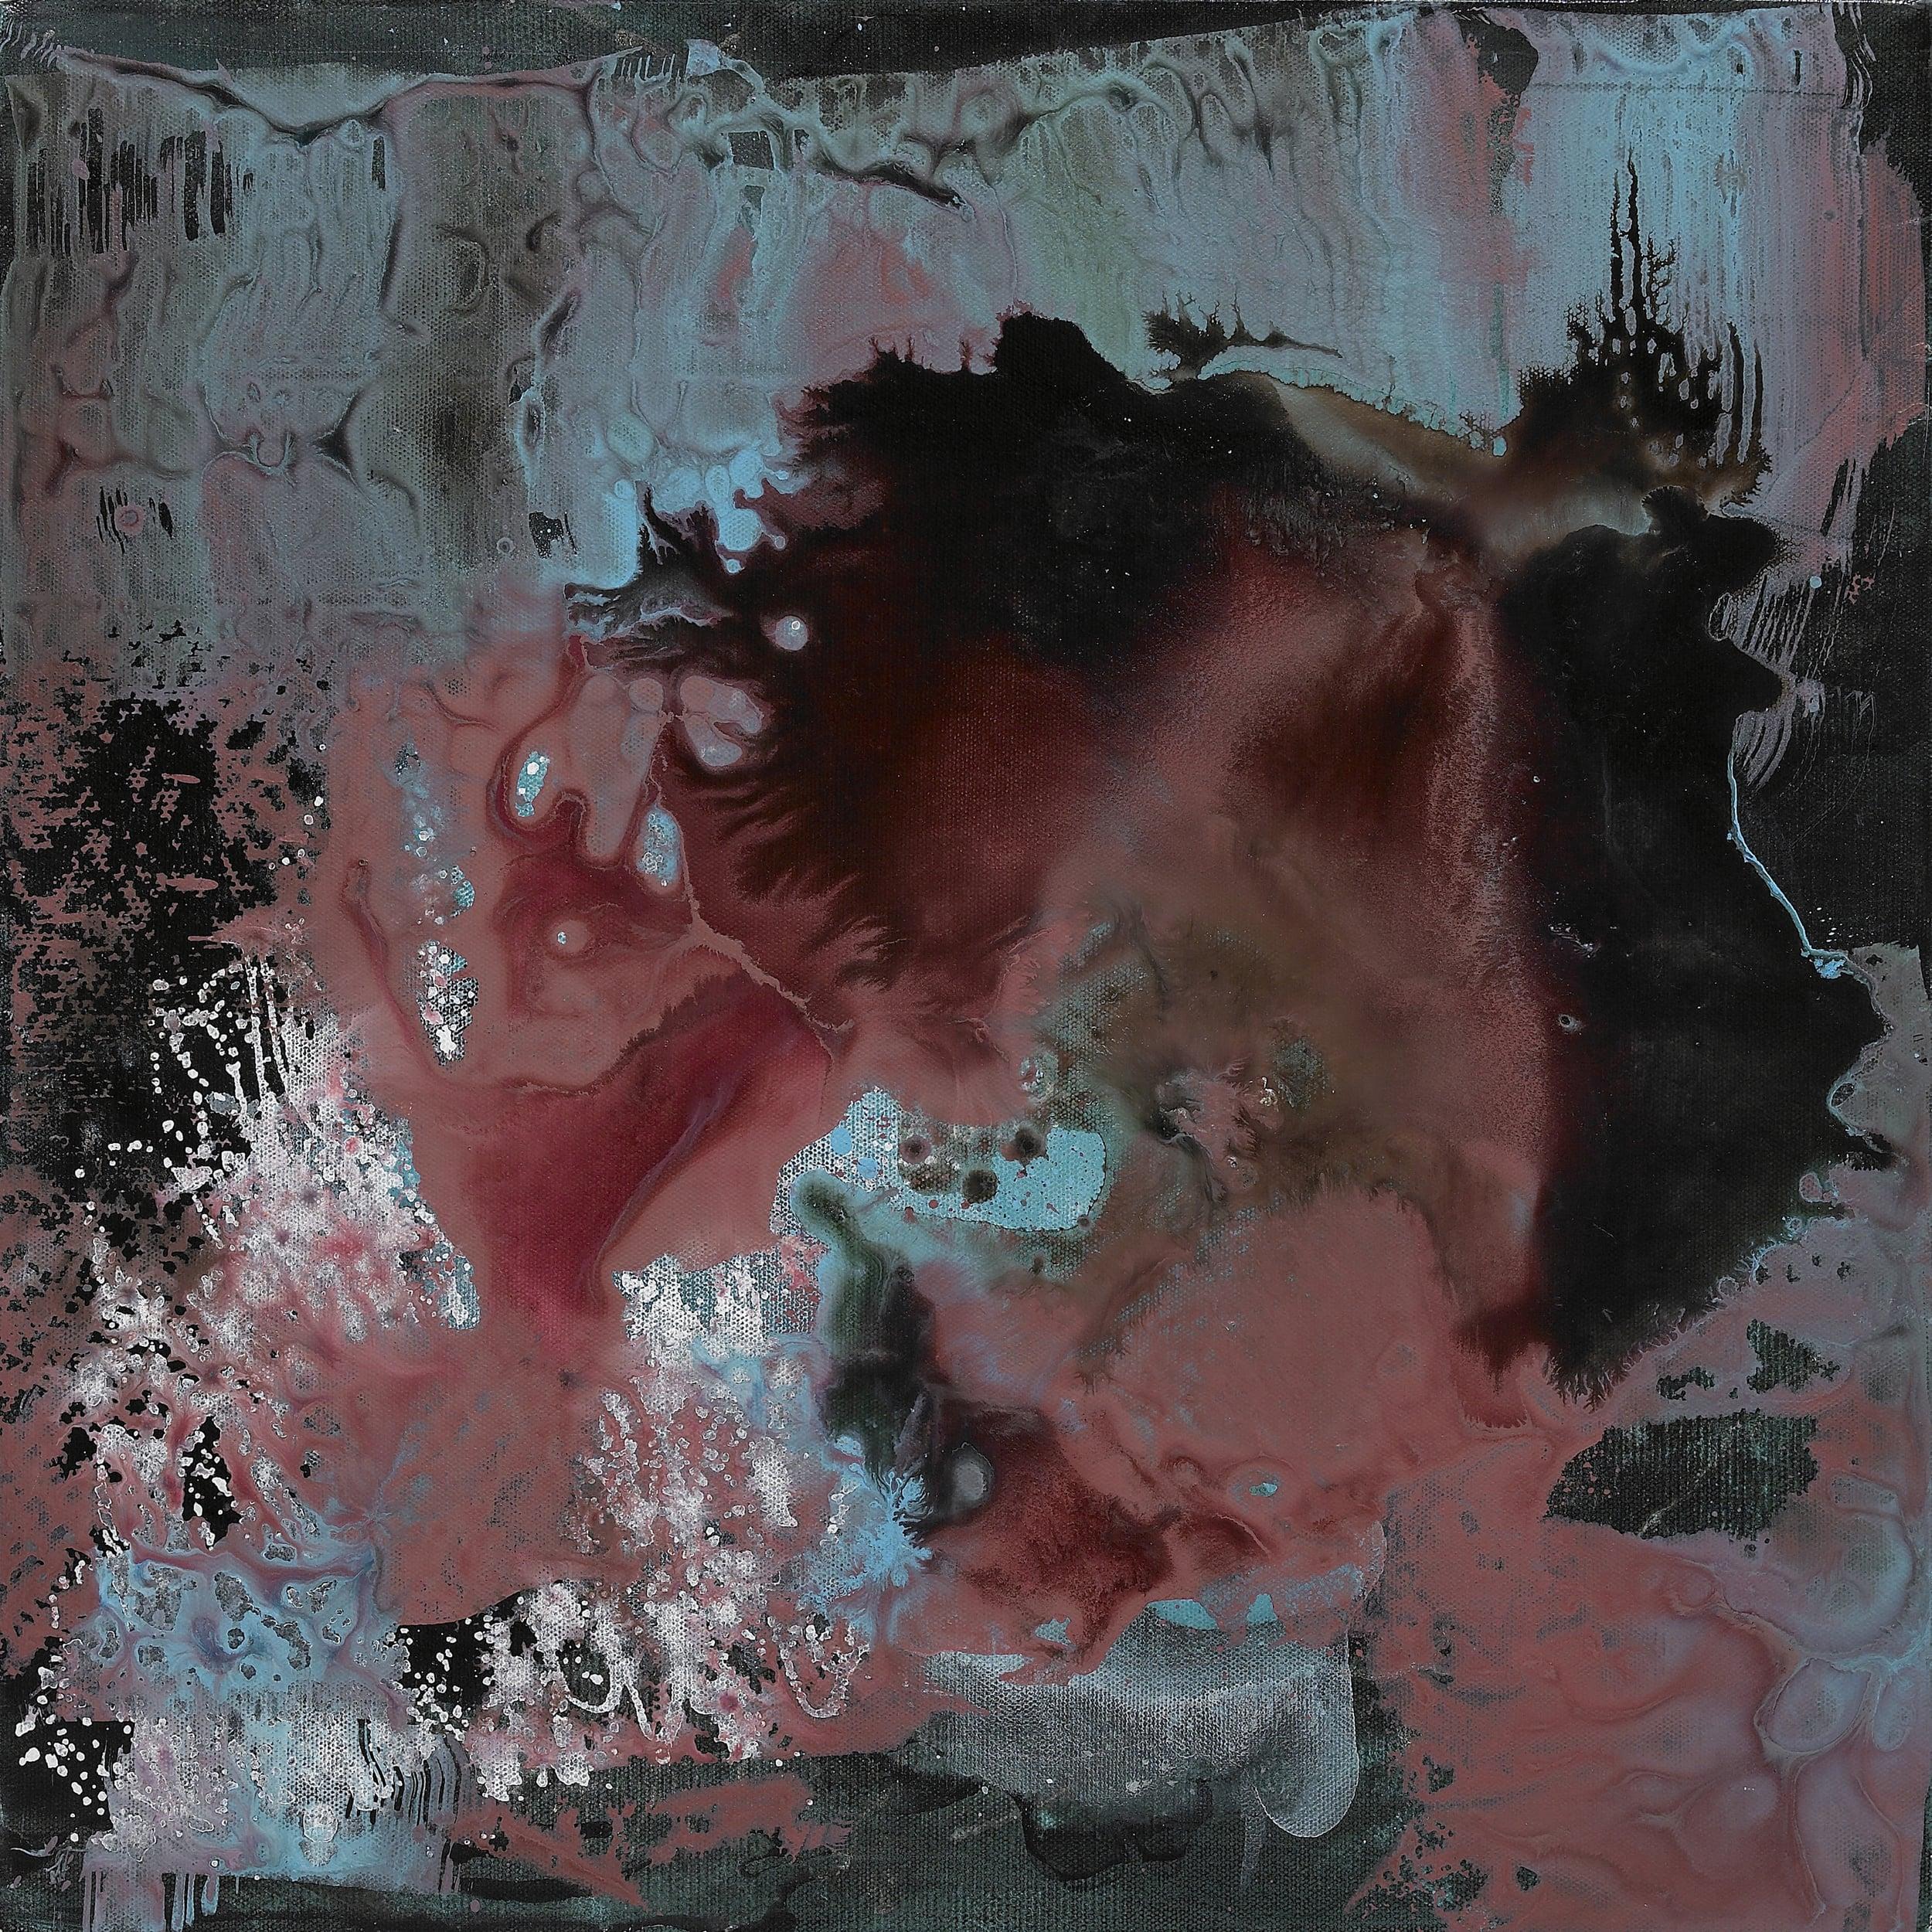 figure_31  acrylic and epoxy  resin on canvas  60 cm X 60 cm  2013